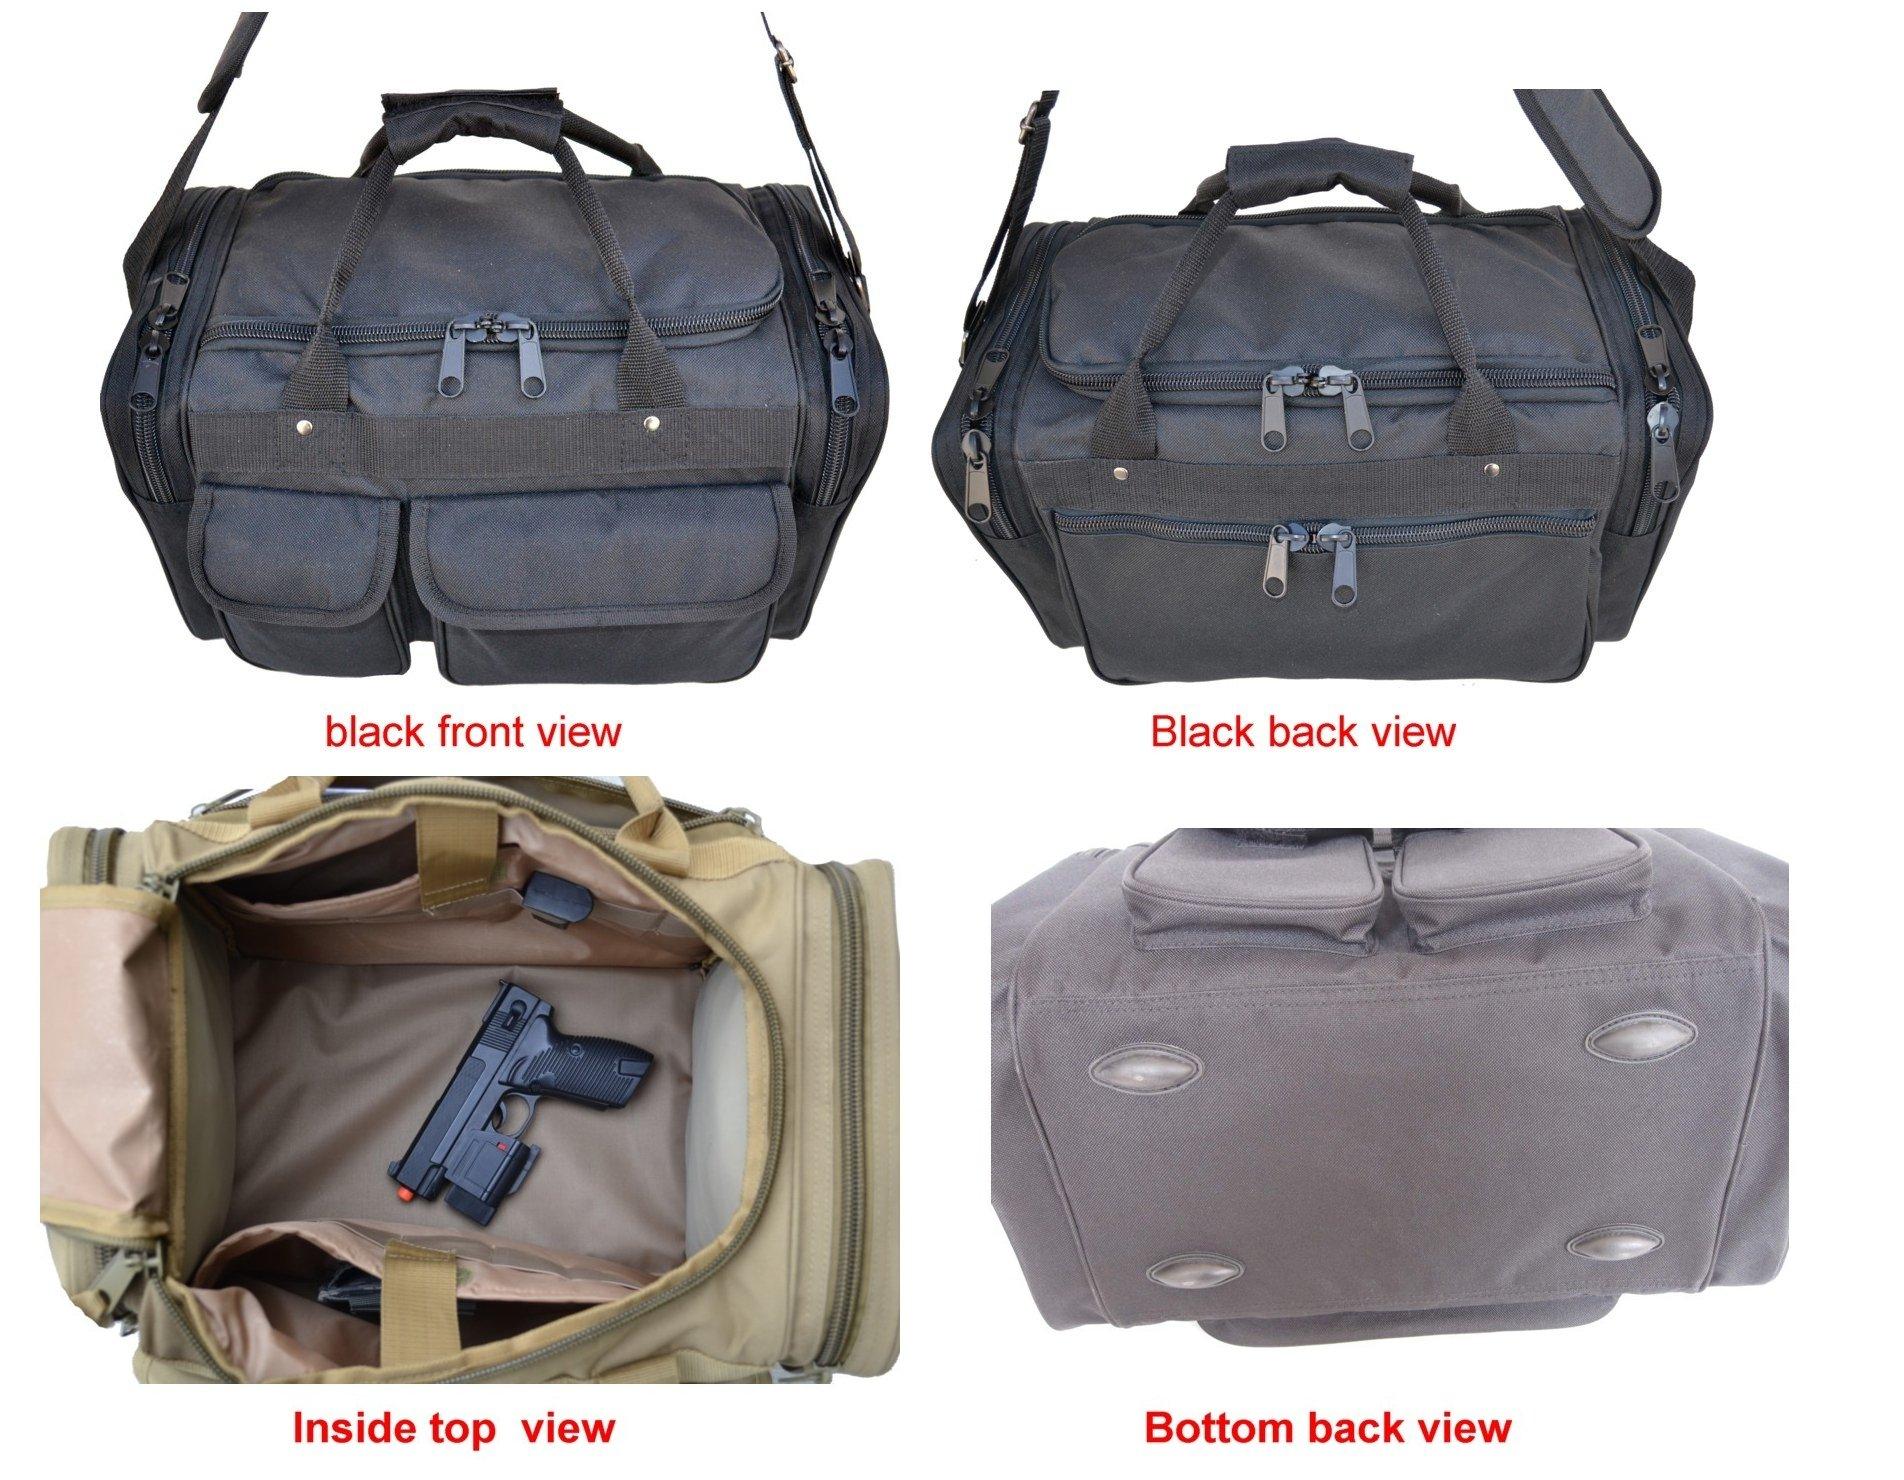 EXPLORER Range Bags Handguns Tactical Gear Shooting Accessories Large 1200 D Gun Bag Waterproof AR Magazine Holders Padded Pistol Cases Ammo Bag by Explorer